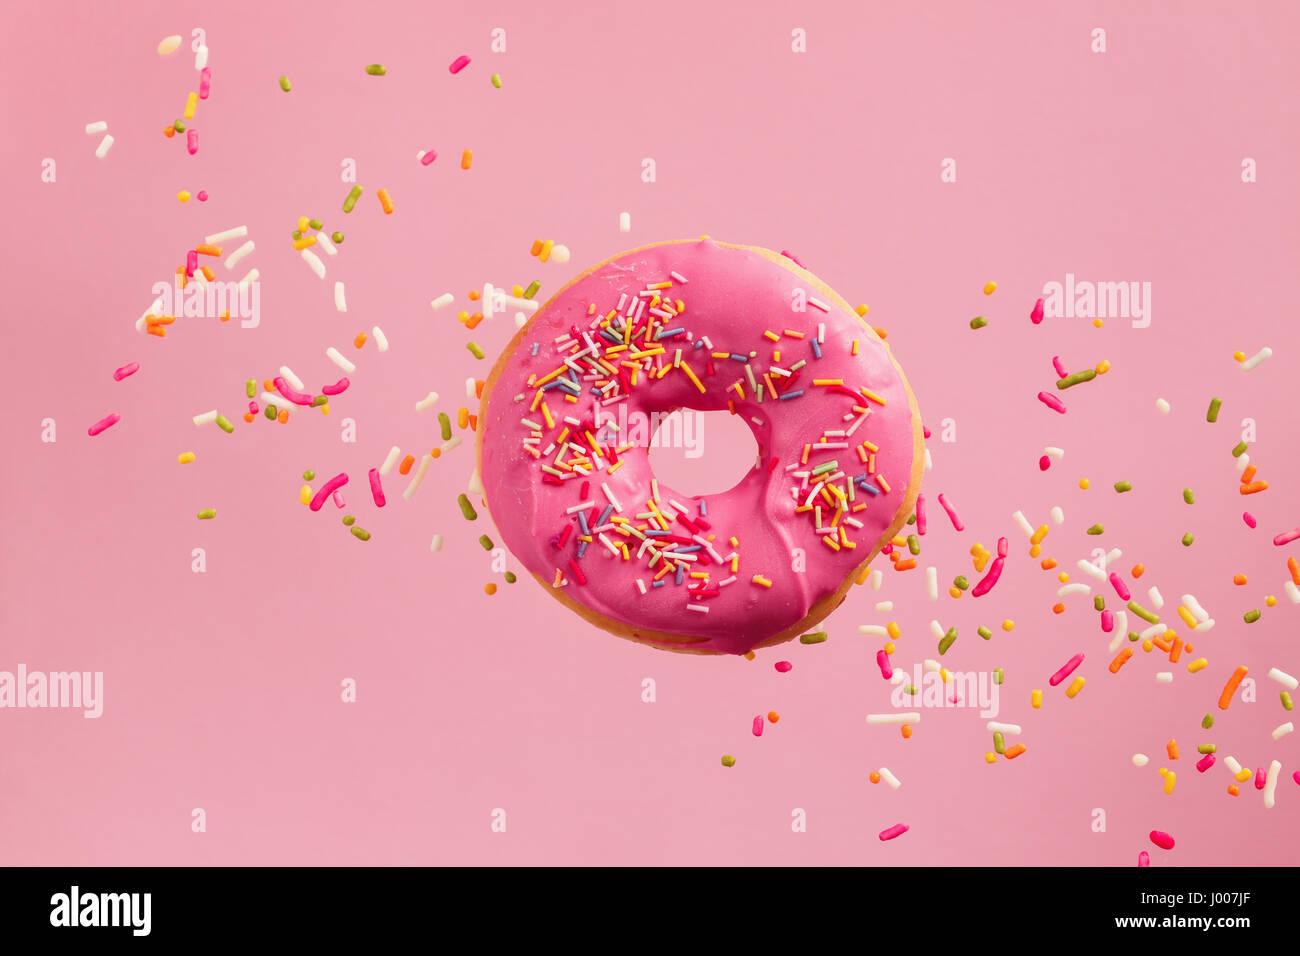 Sprinkled Pink Donut. Pink frosted sprinkled donut on pink background. Stock Photo